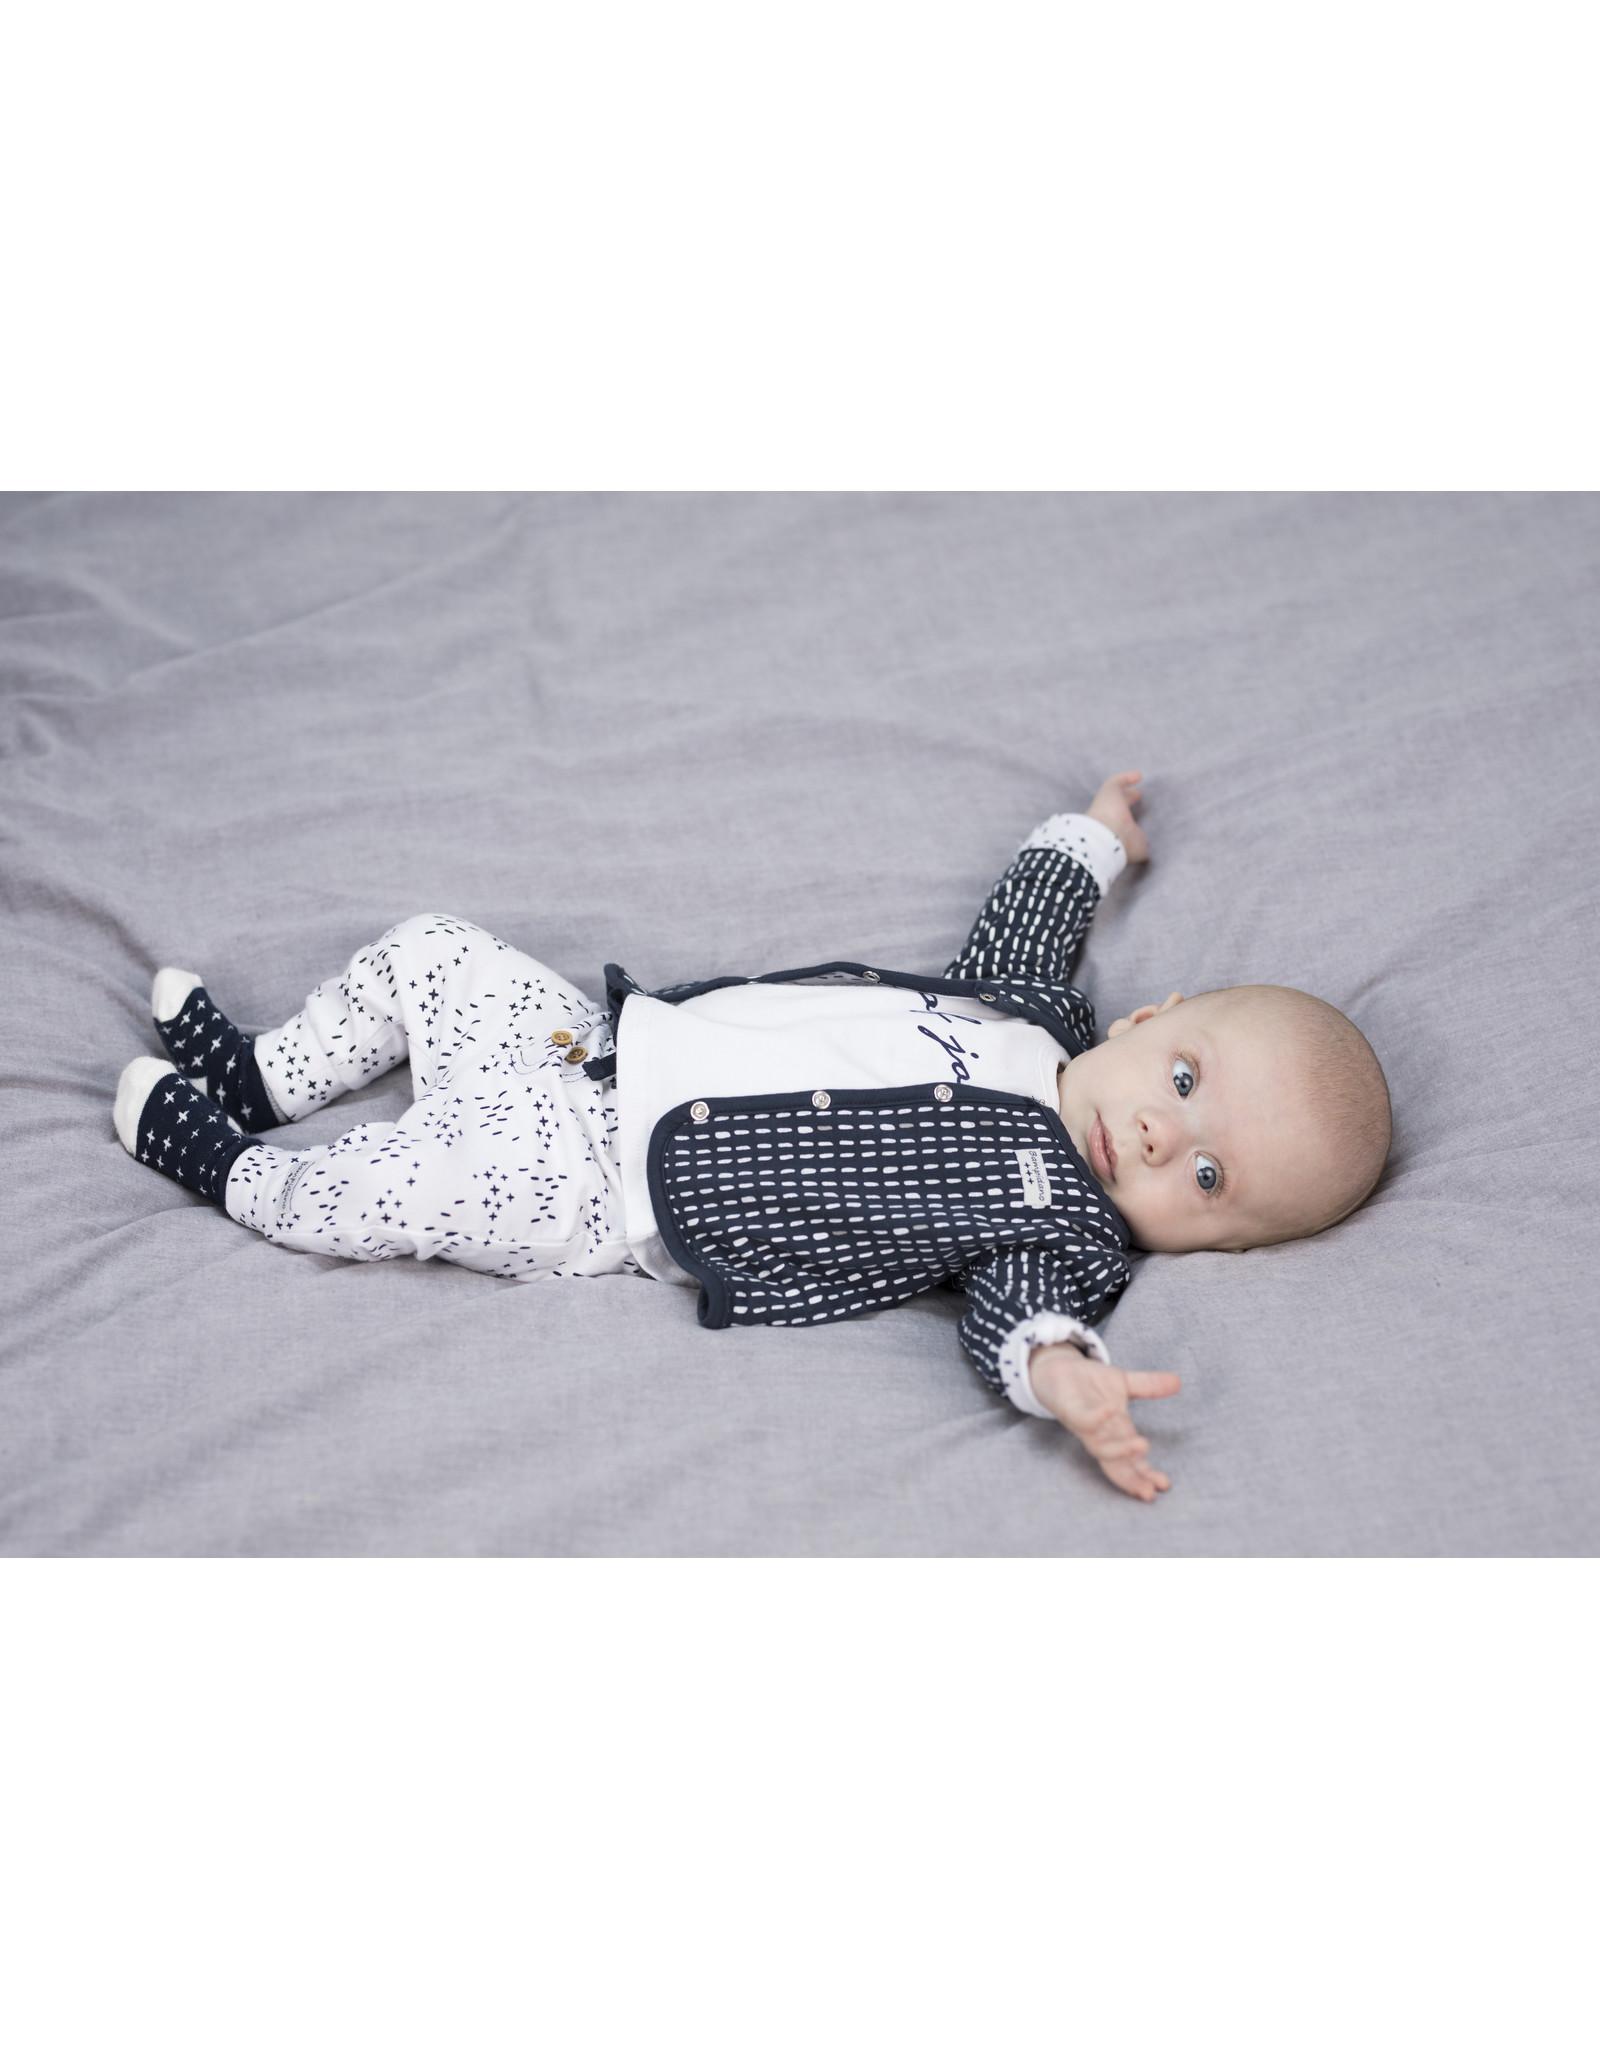 Little Bampidano LB- New Born Revers. AOP Stripes-Criss Cross- Navy Allover